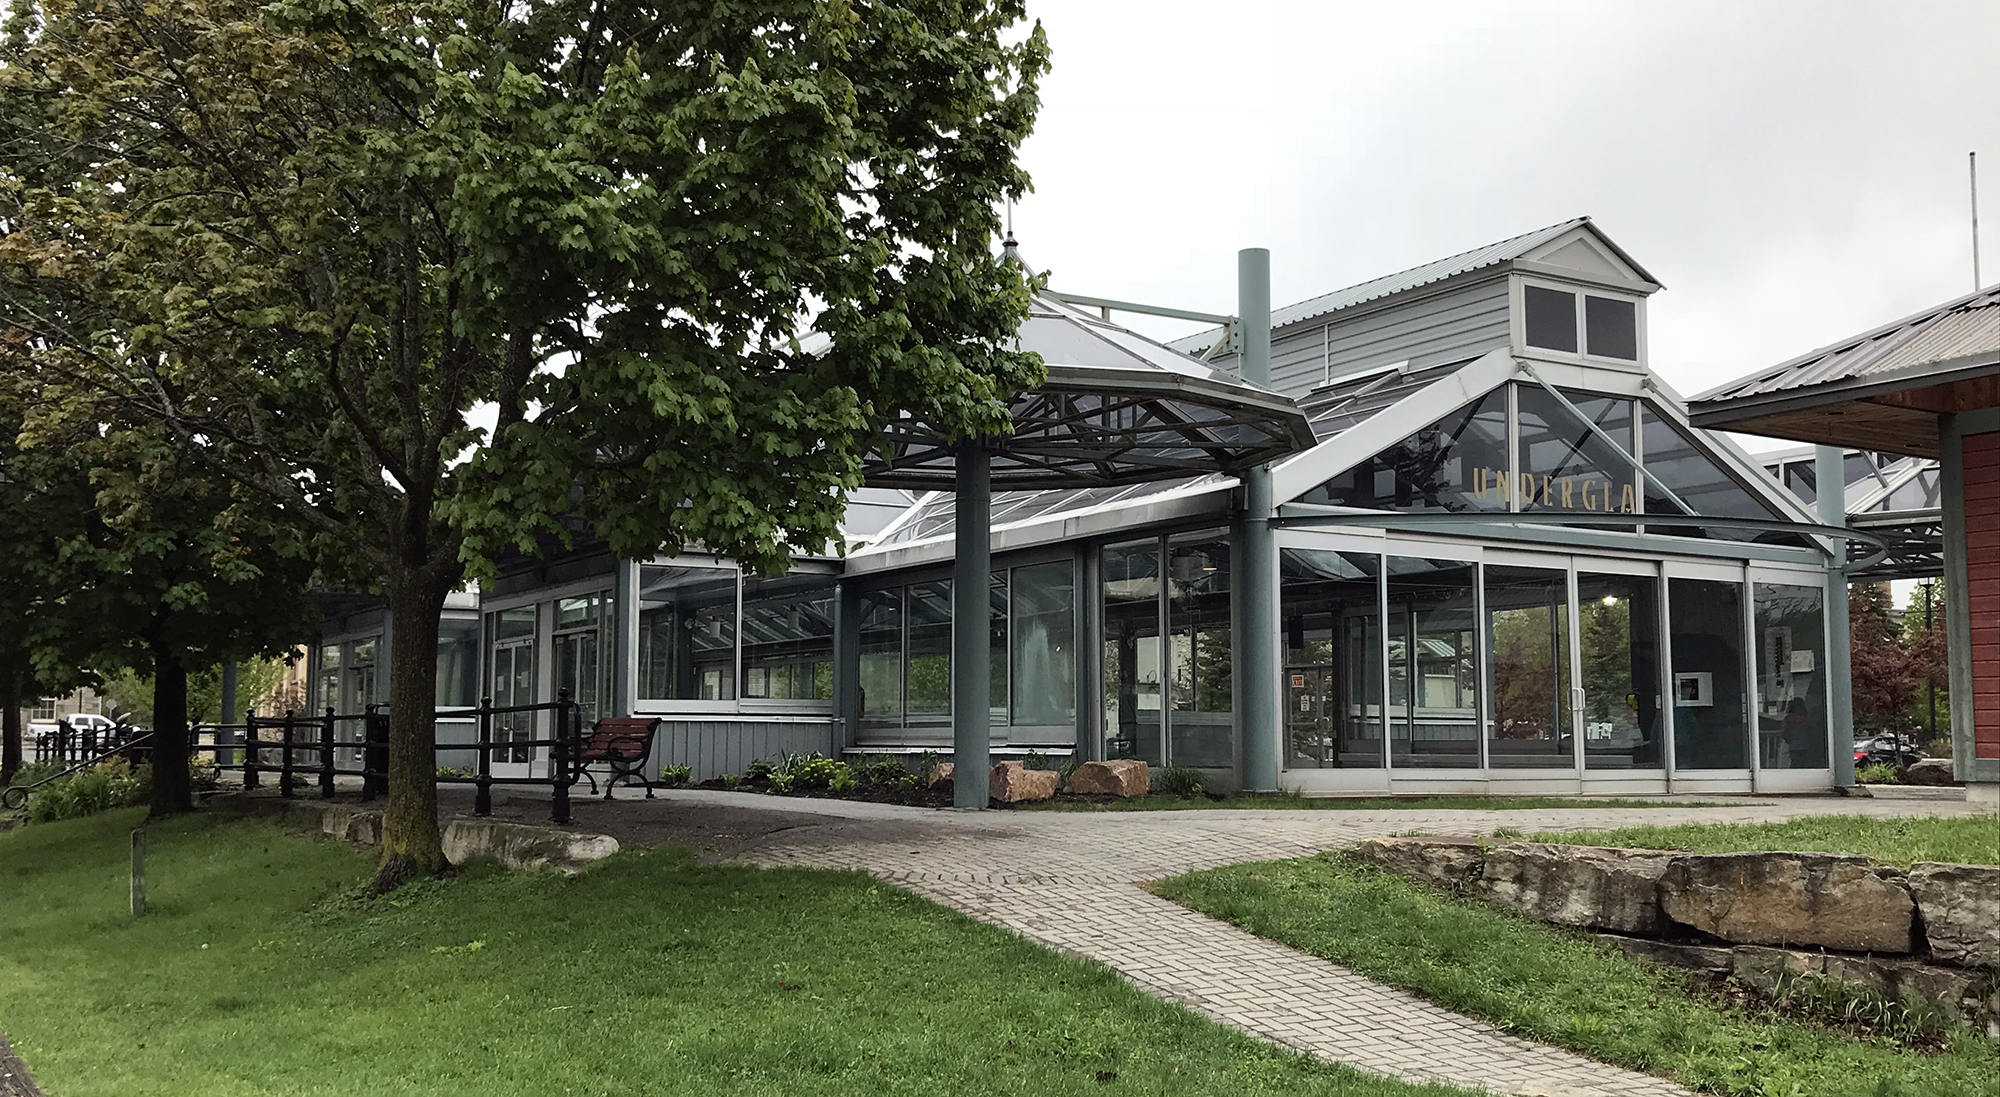 Perth Ontario - Glass Palace - Farmers Market